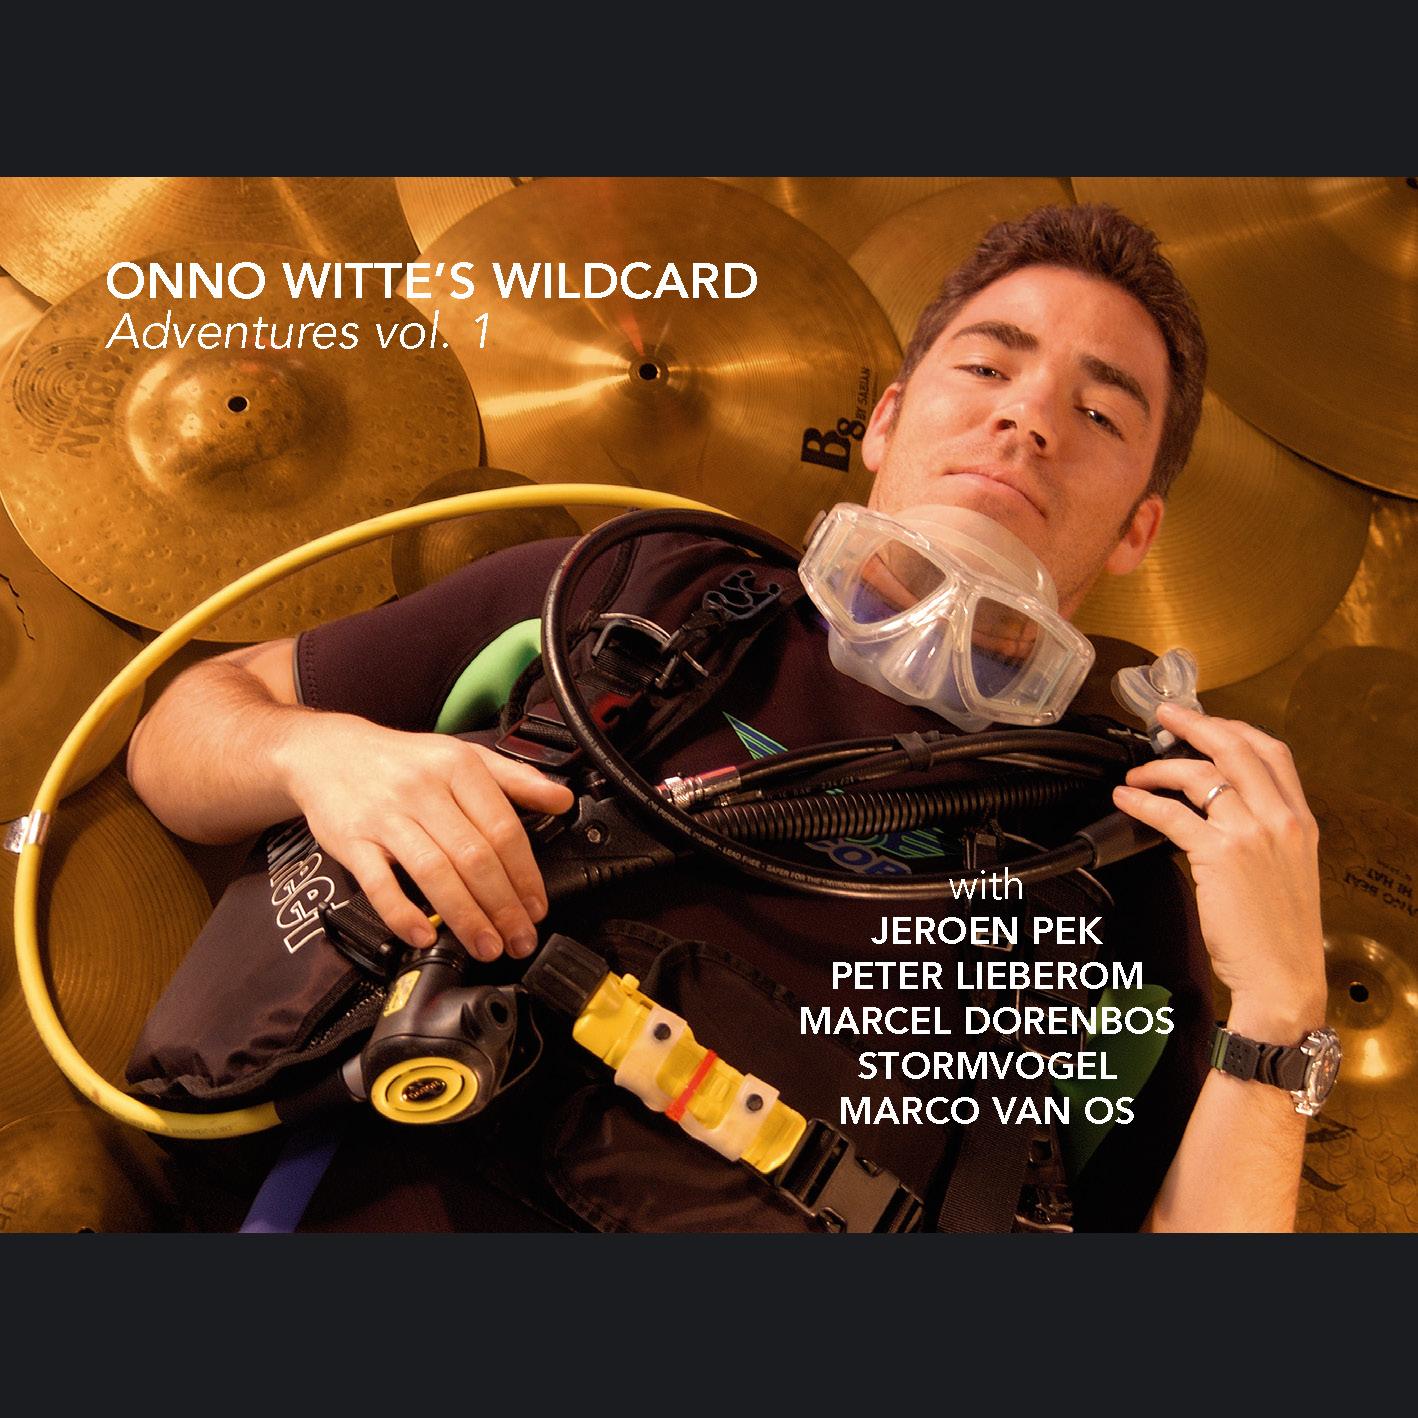 Onno Witte's Wildcard